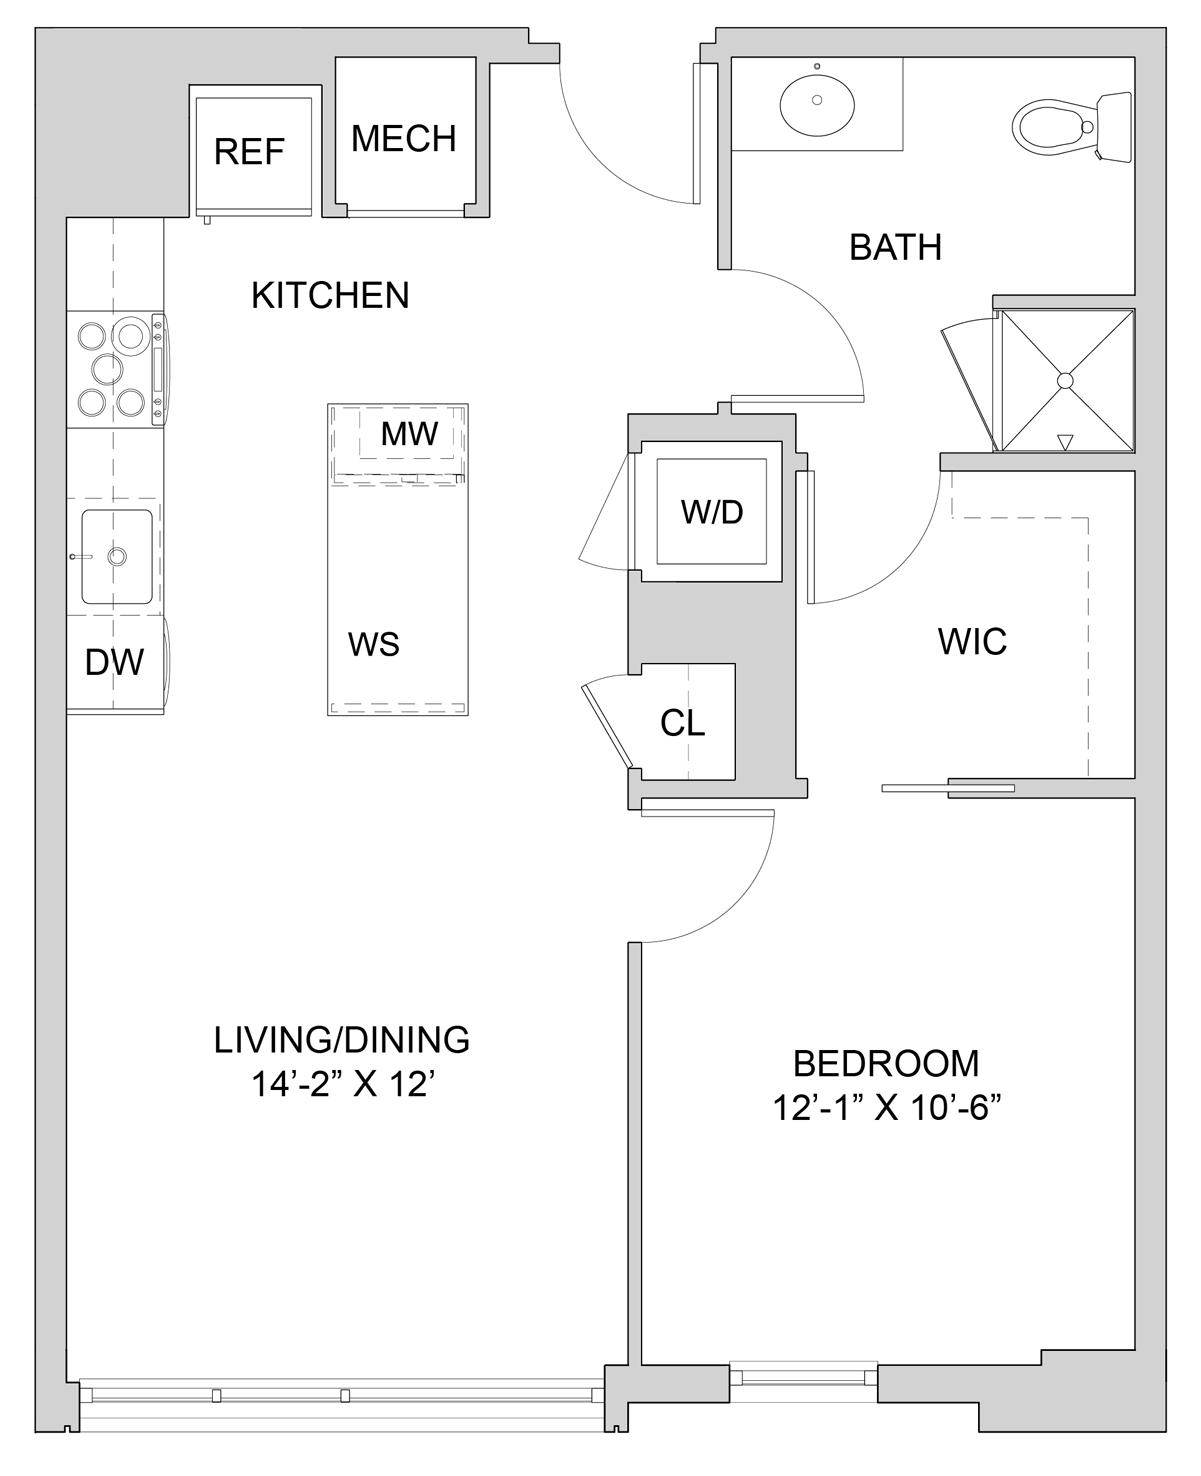 Floorplan W416 Image